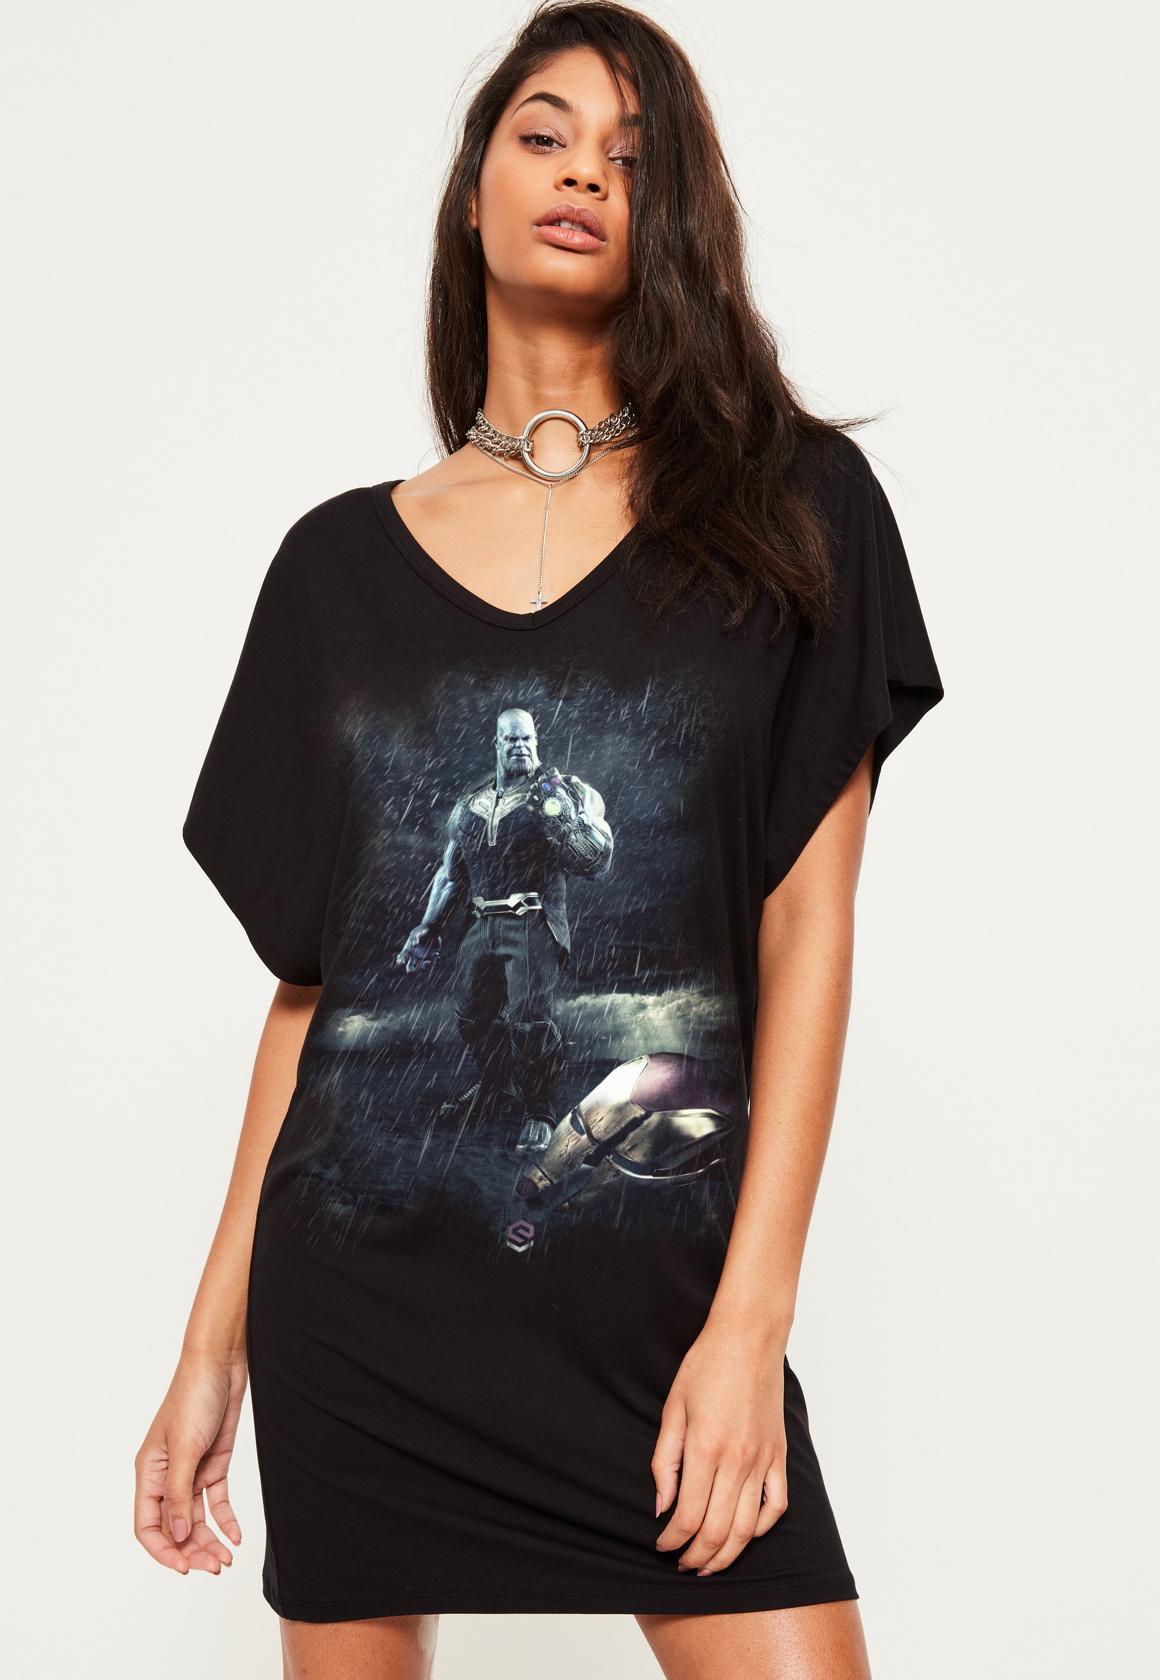 shirt_comp4.jpg